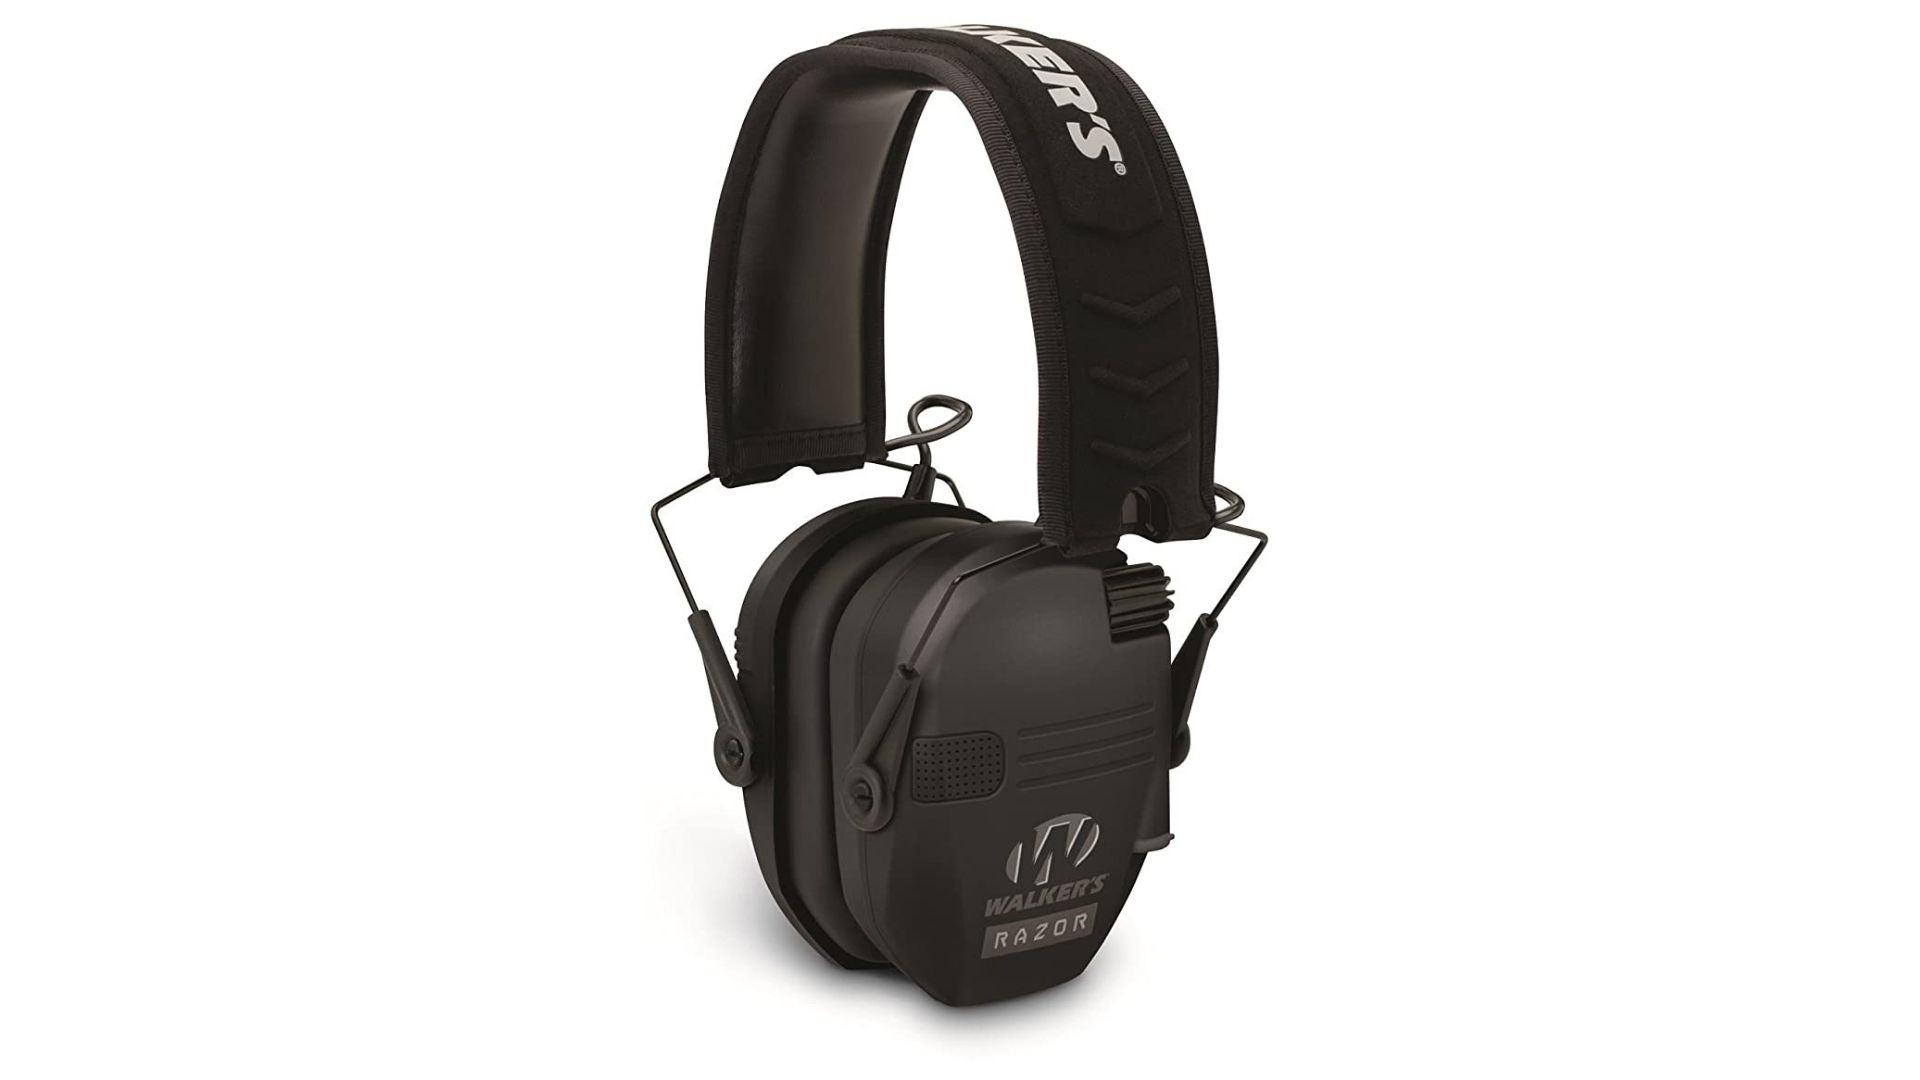 Walkers Razor hearing protection